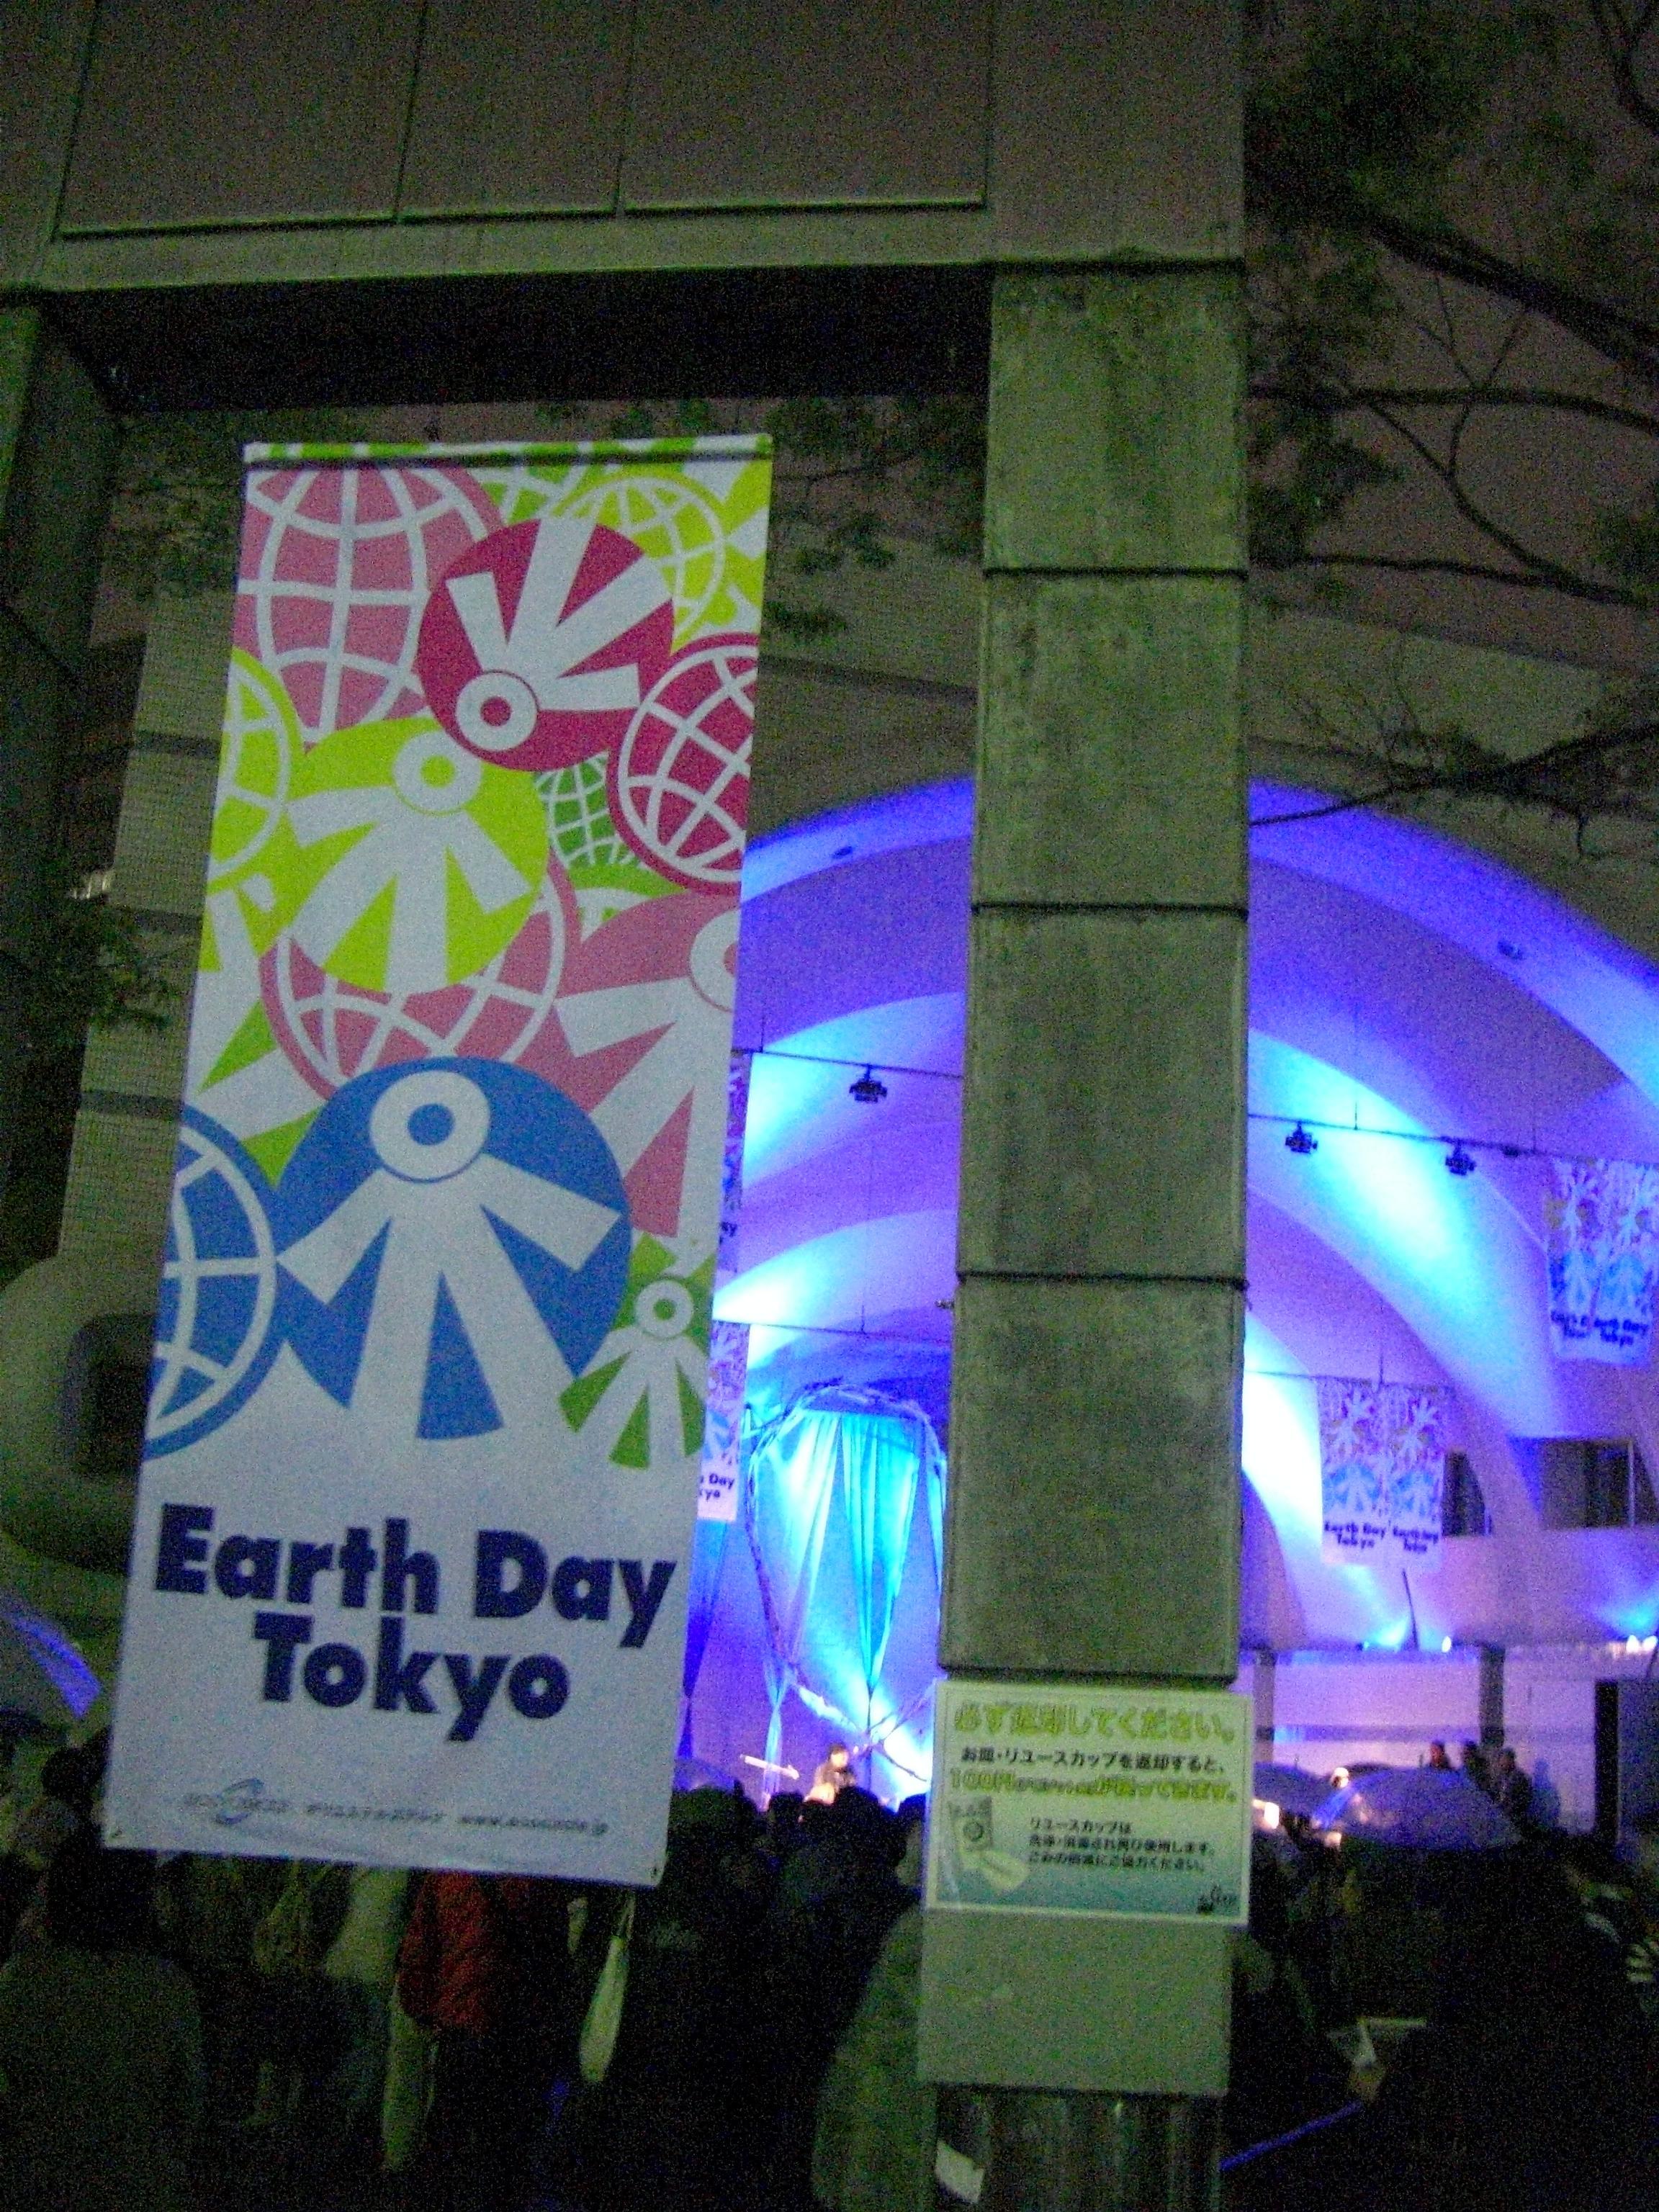 earth day tokyo 2008